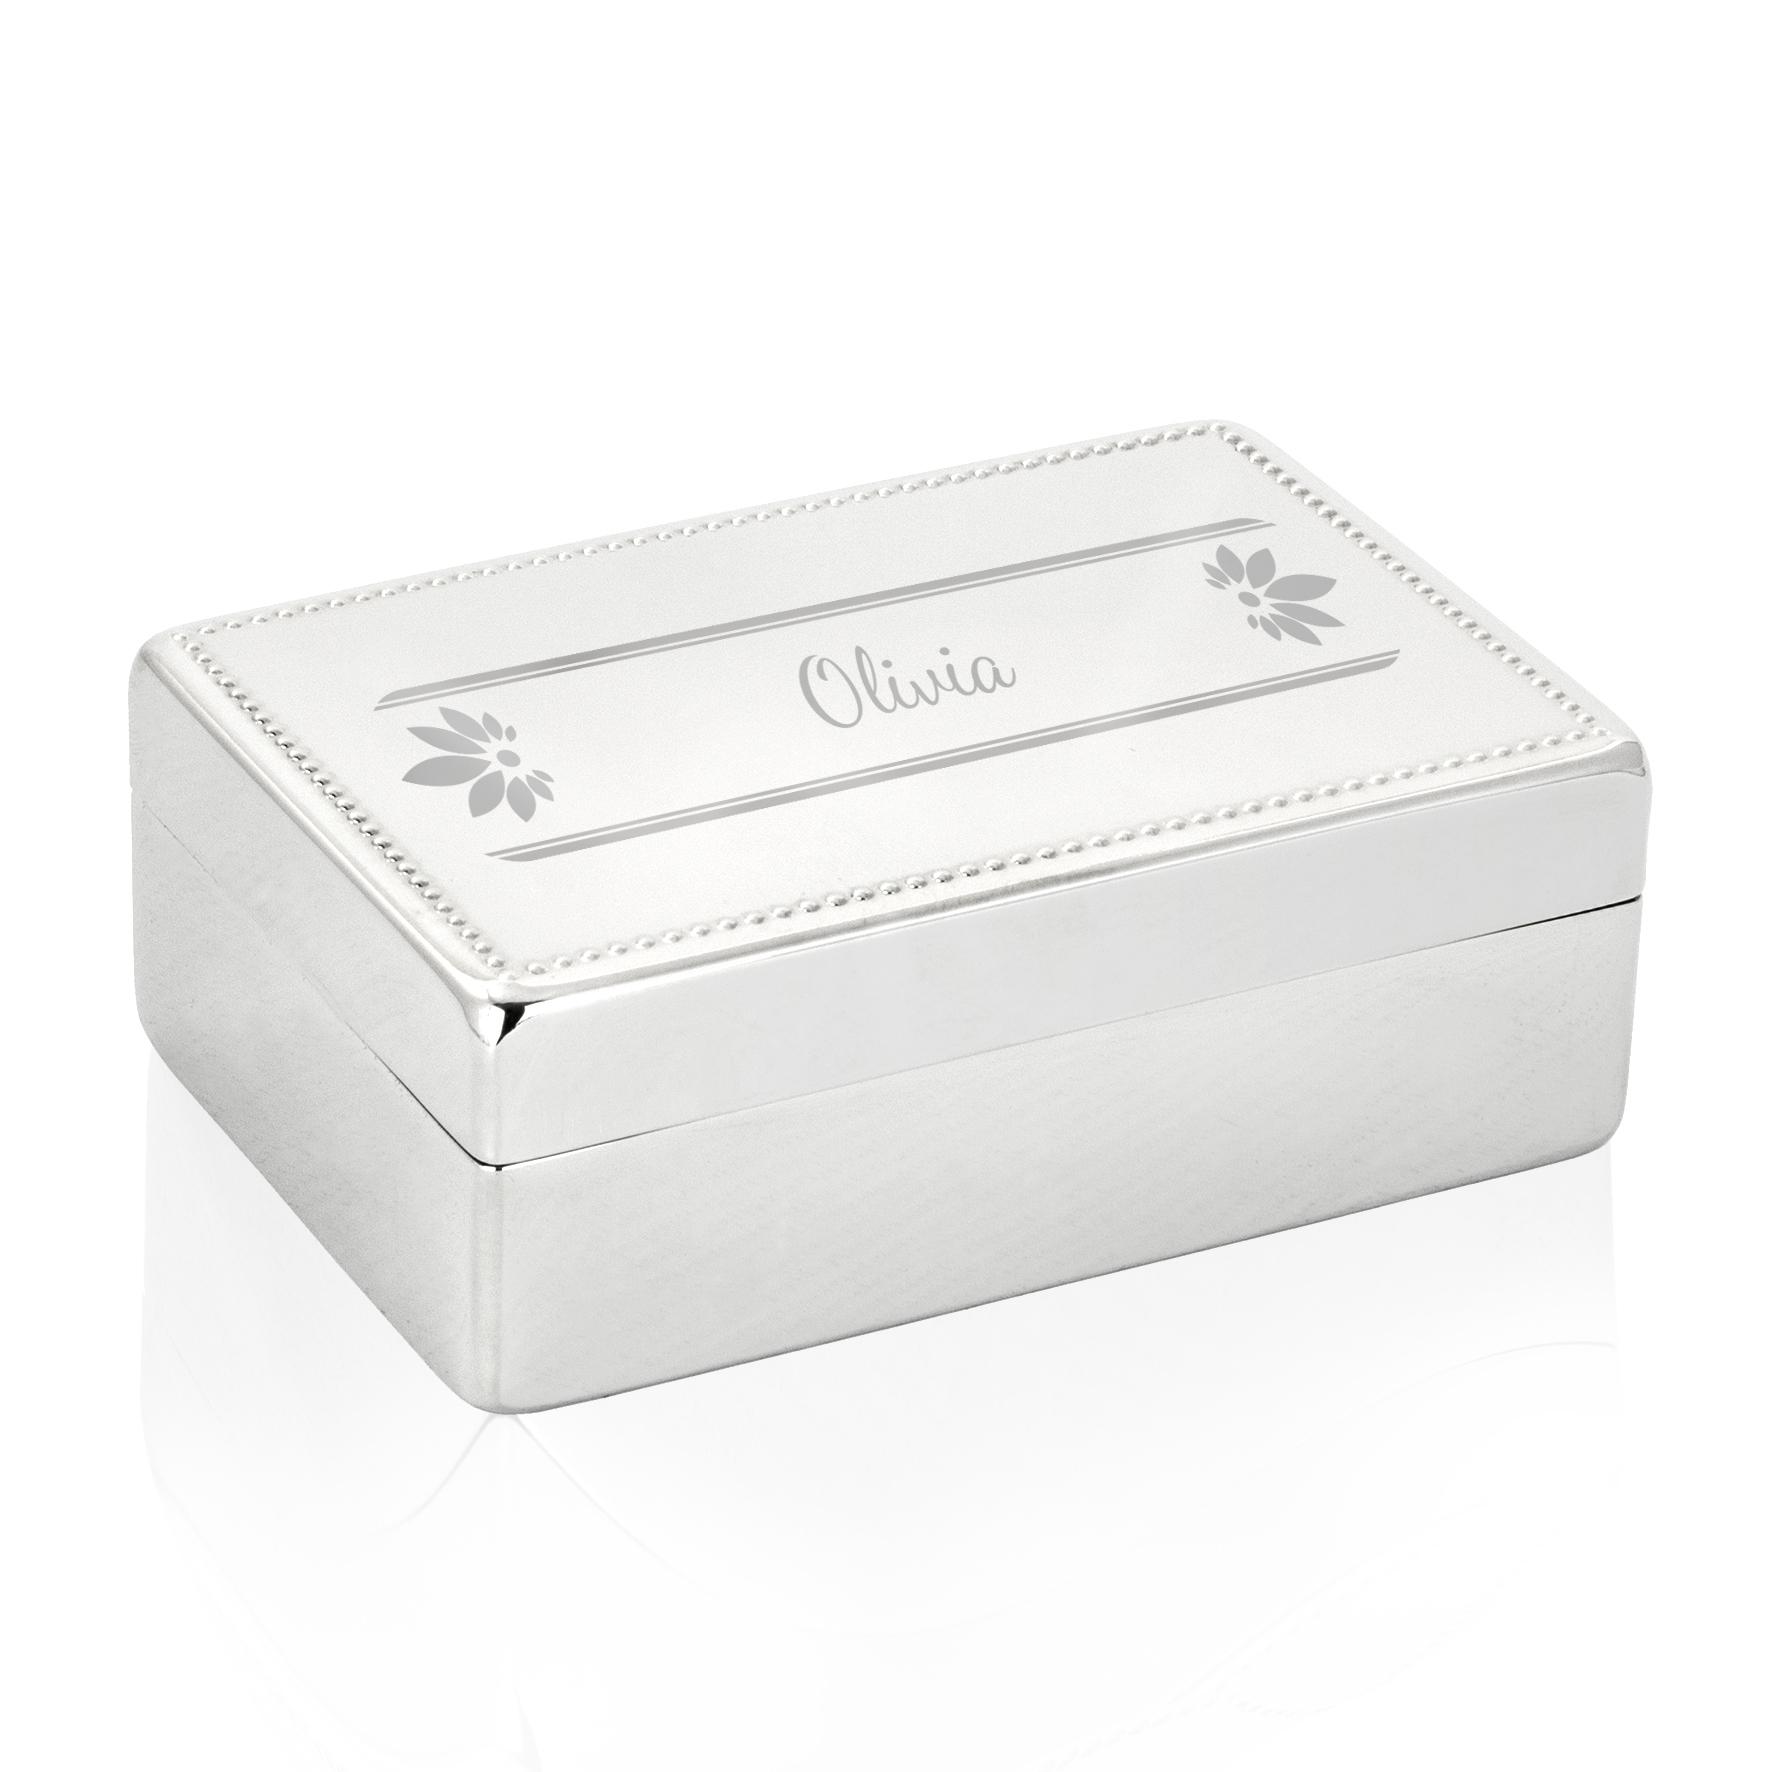 Engraved Petals Rectangle Jewellery Box